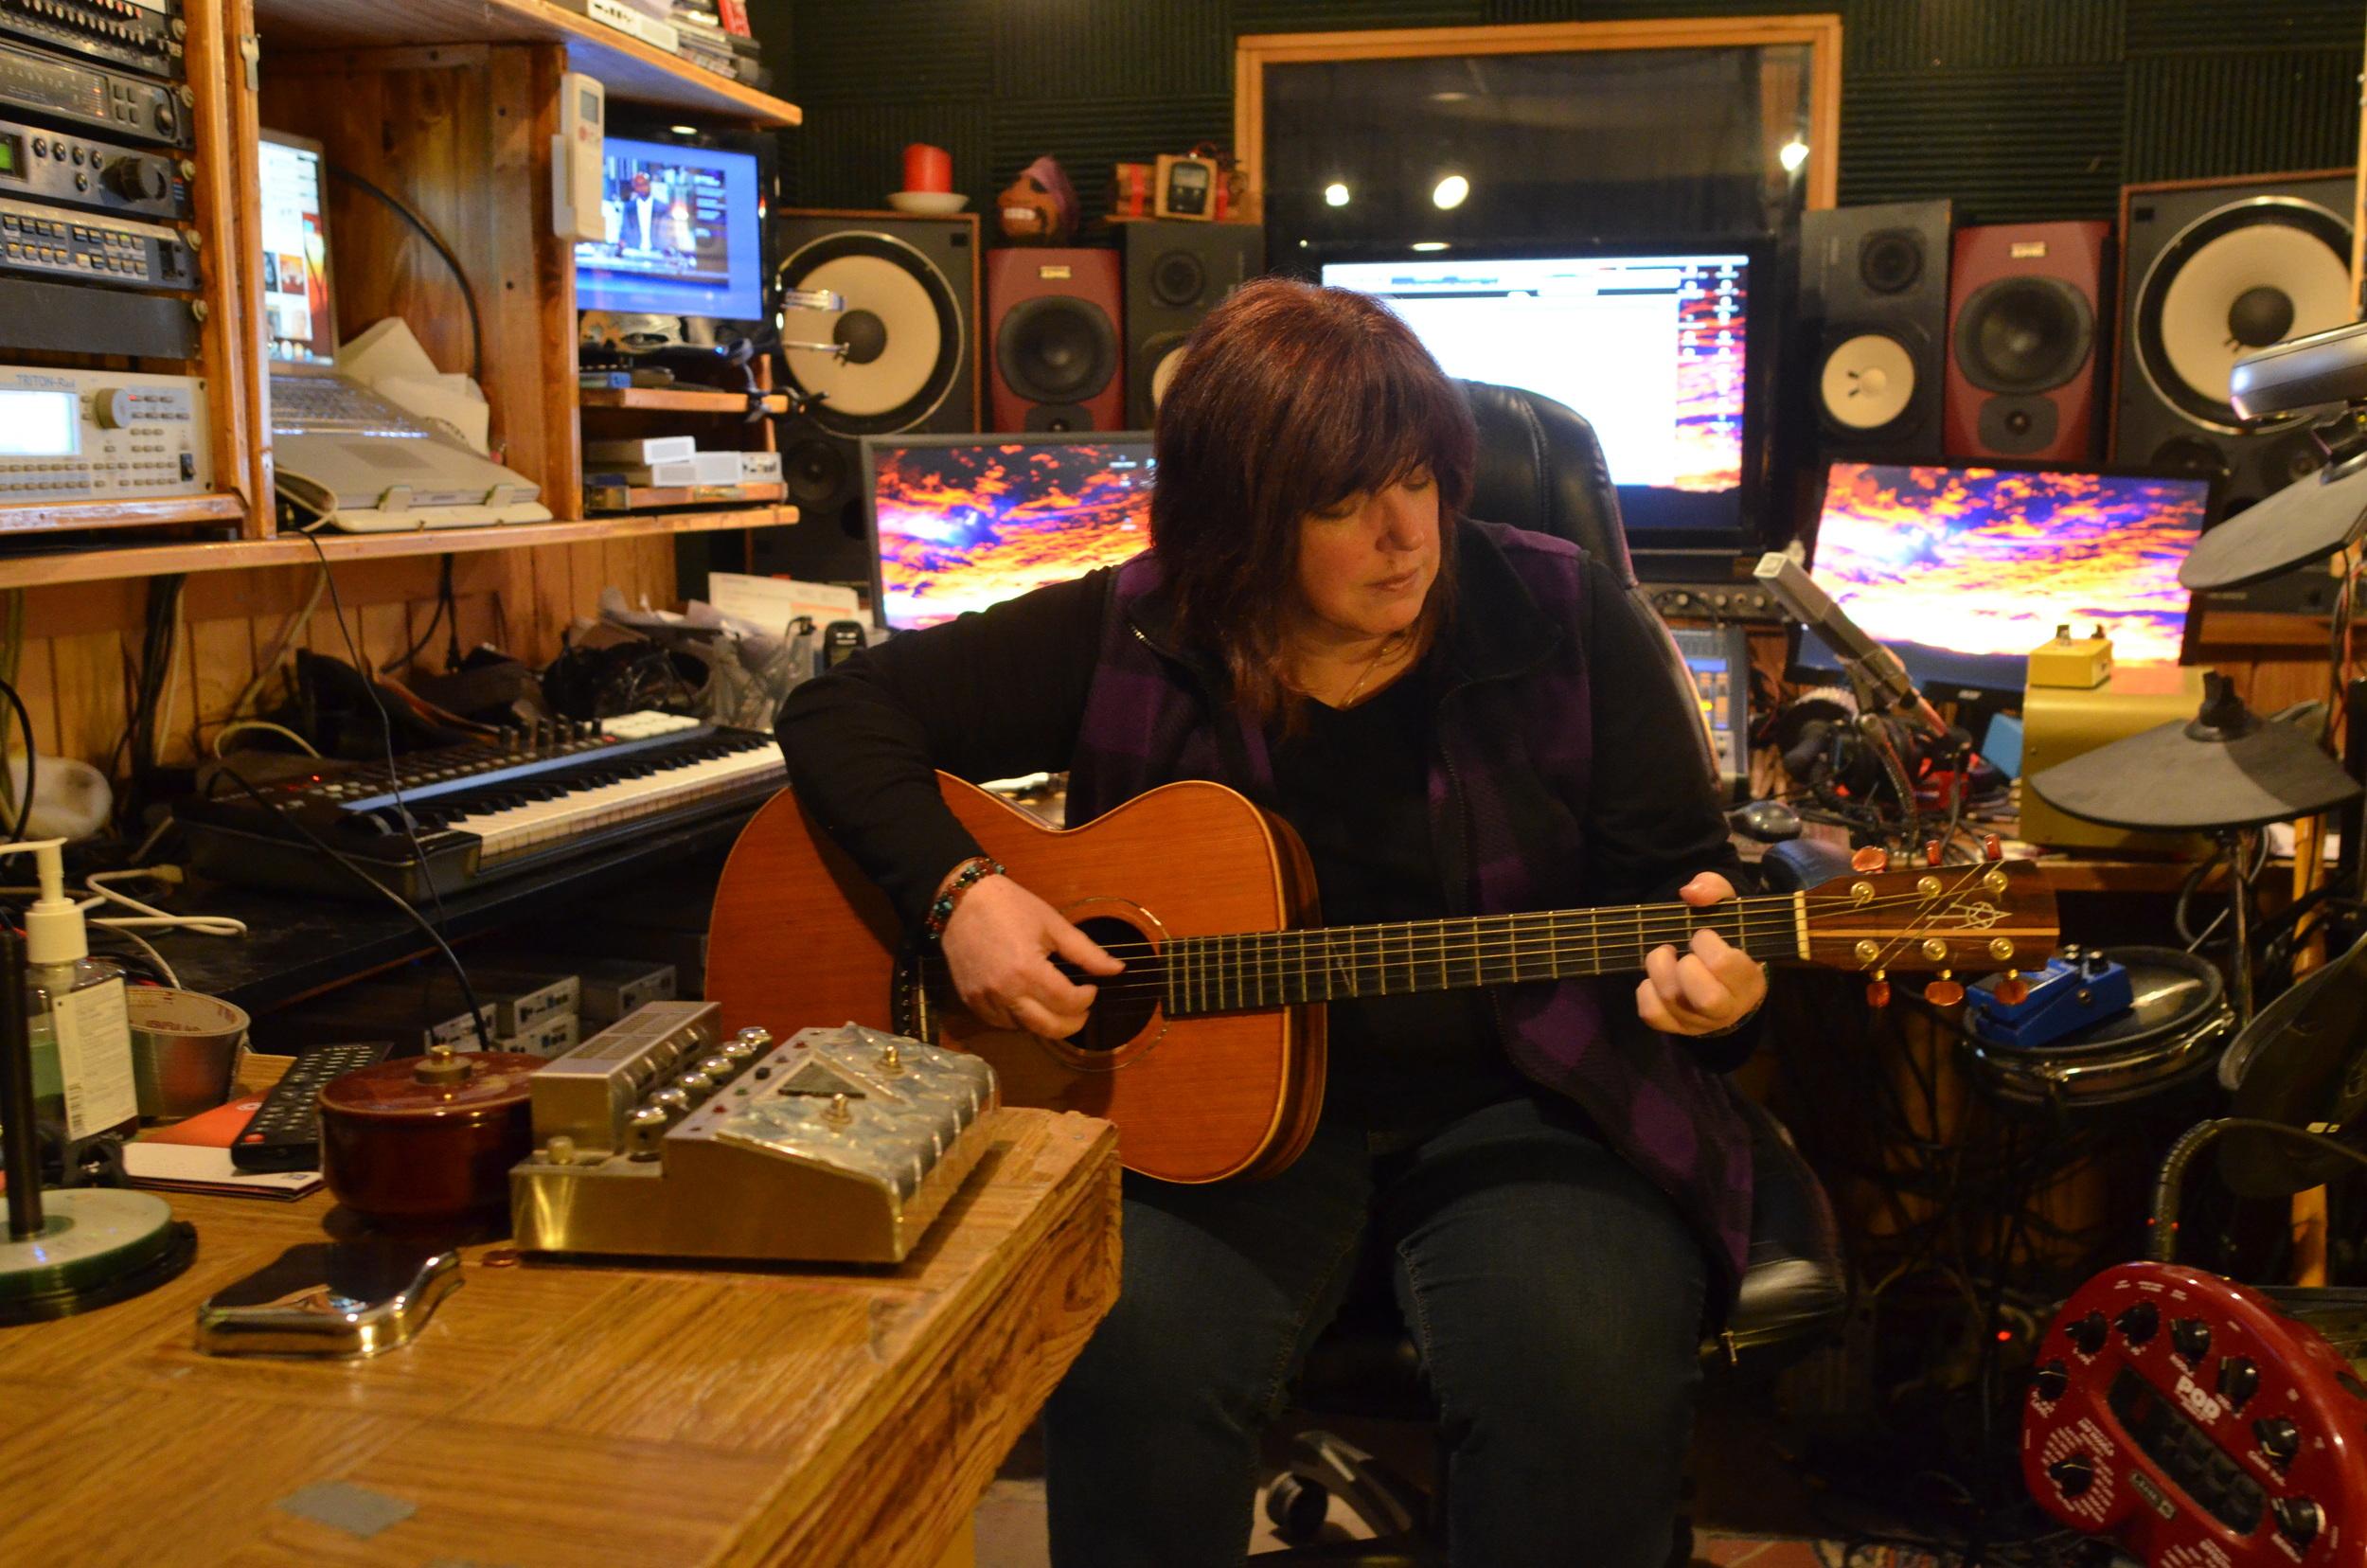 Long Hill Studios, Shelton CT